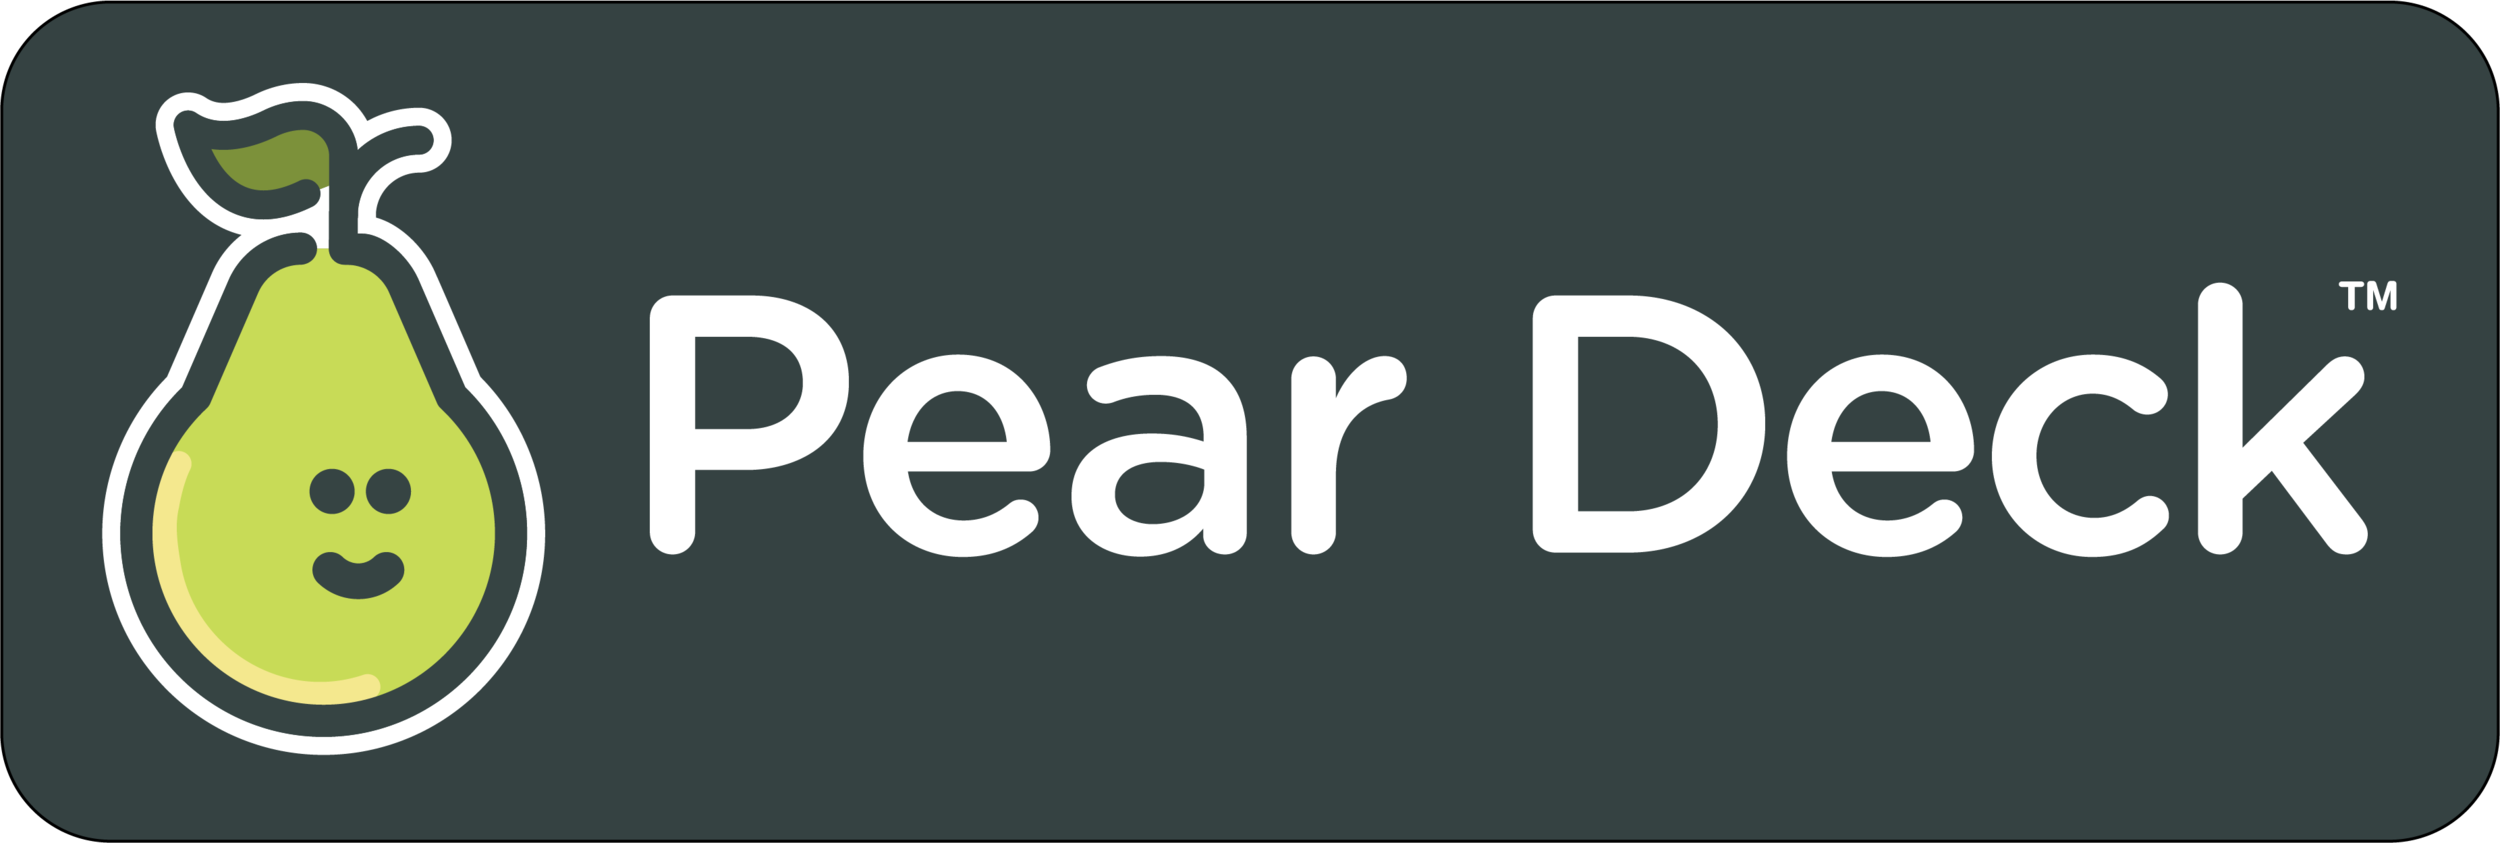 Image result for pear deck logo